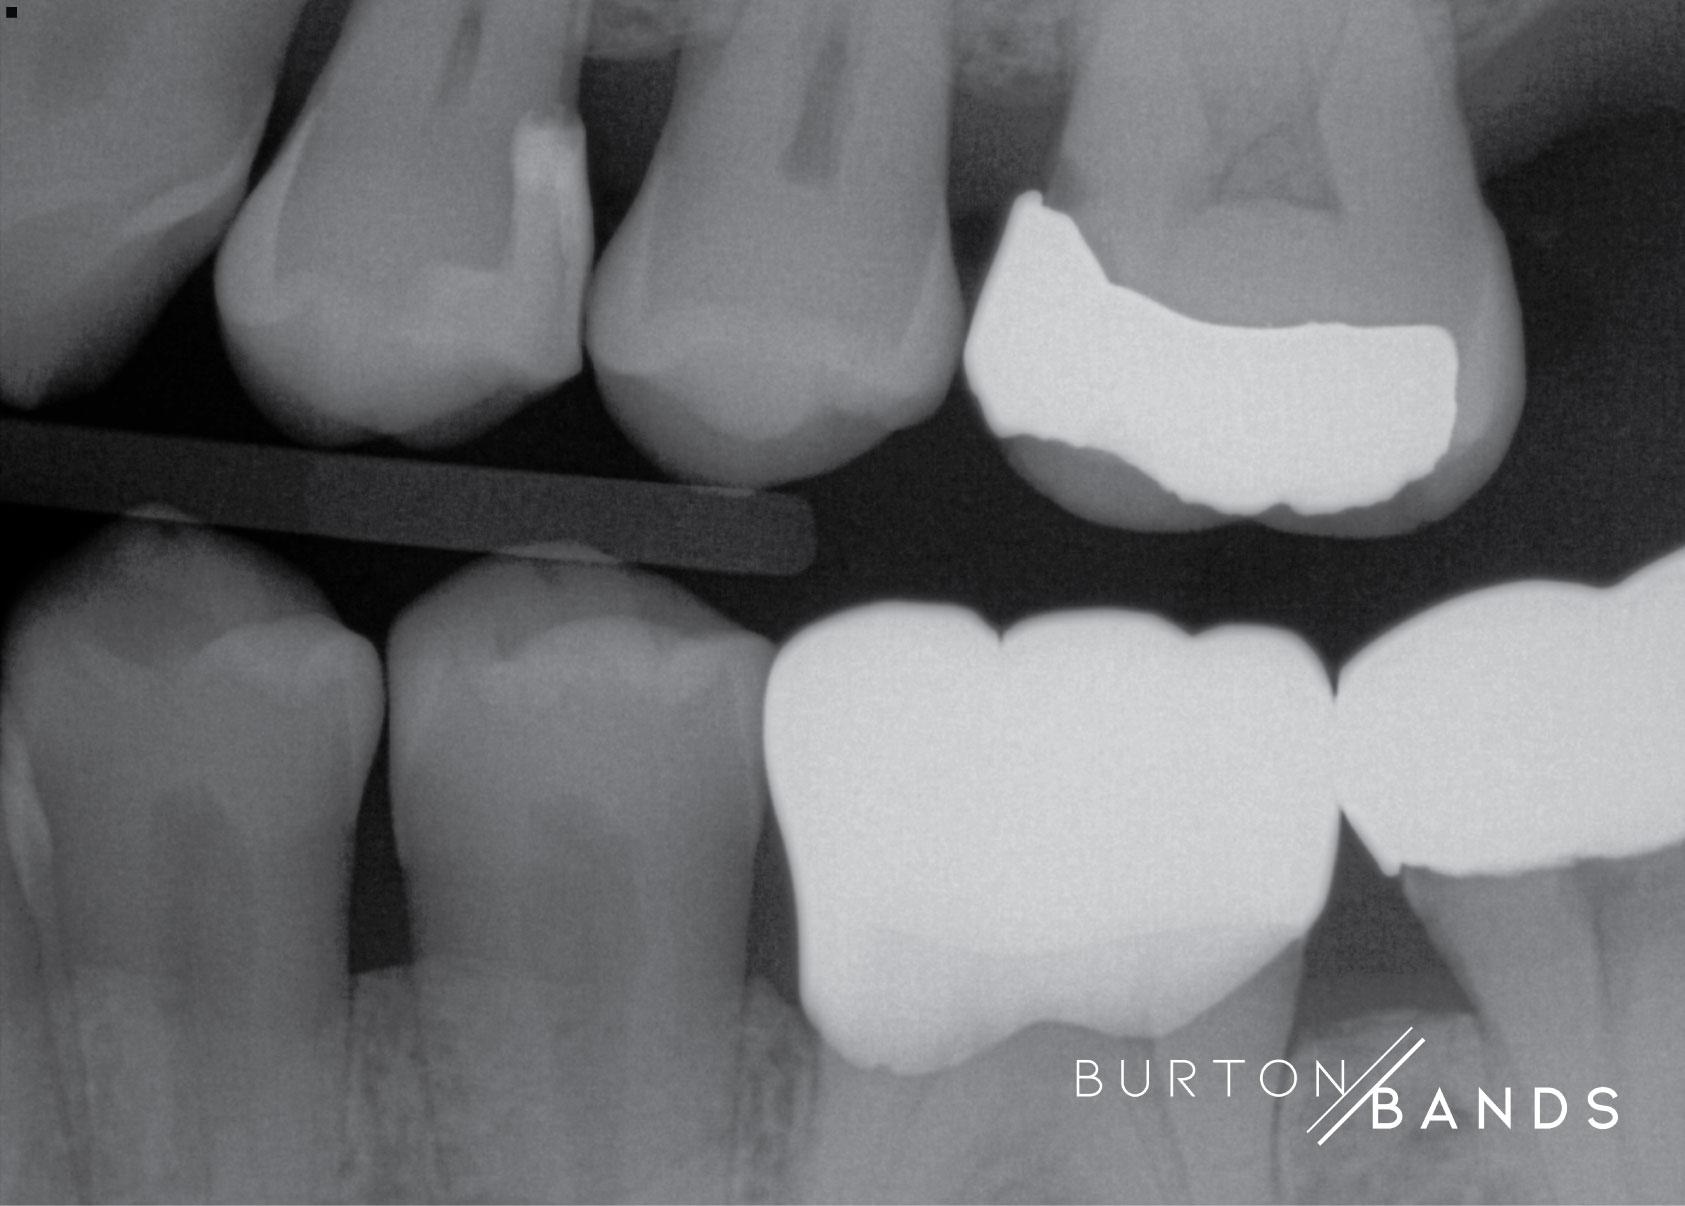 burton-image-3.jpg